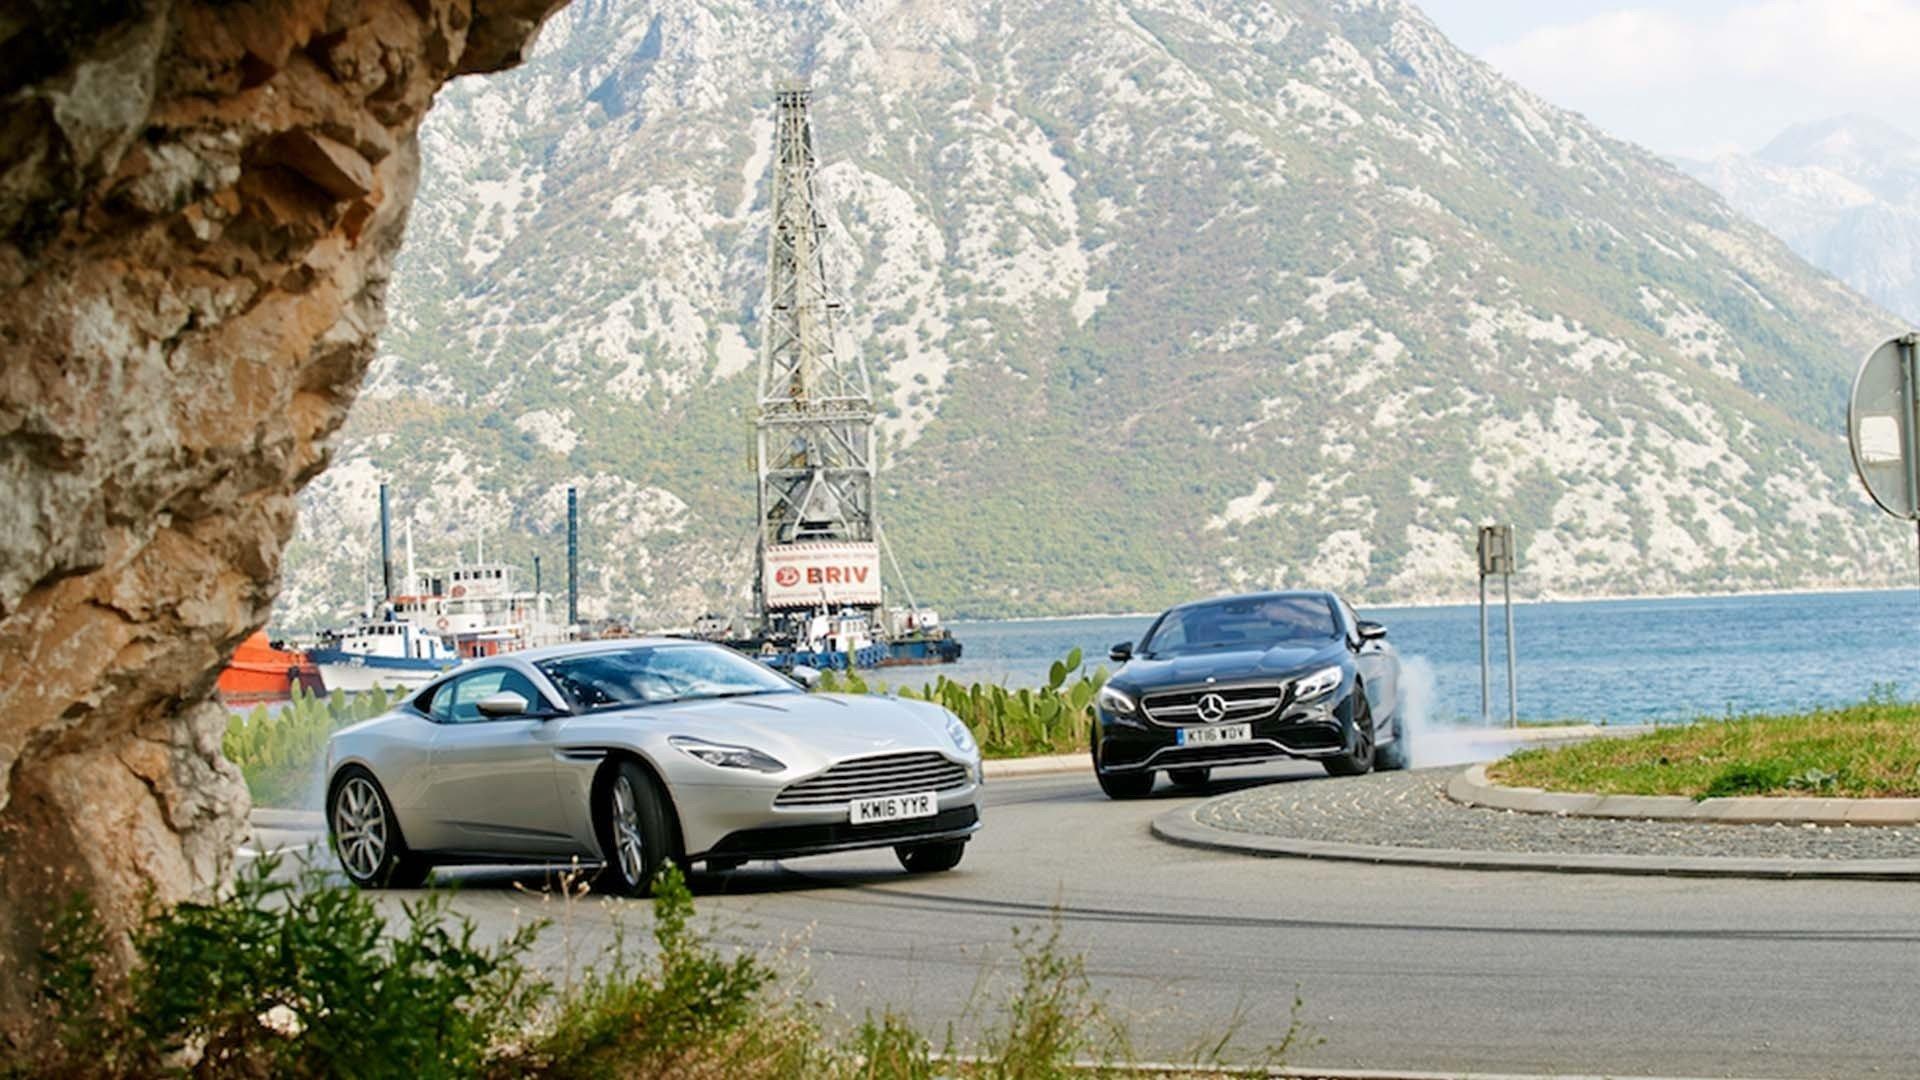 Top Gear 24 Episode 3 James Bond Shootout Aston Martin Db11 Vs Mercedes Amg S63 Motortrend